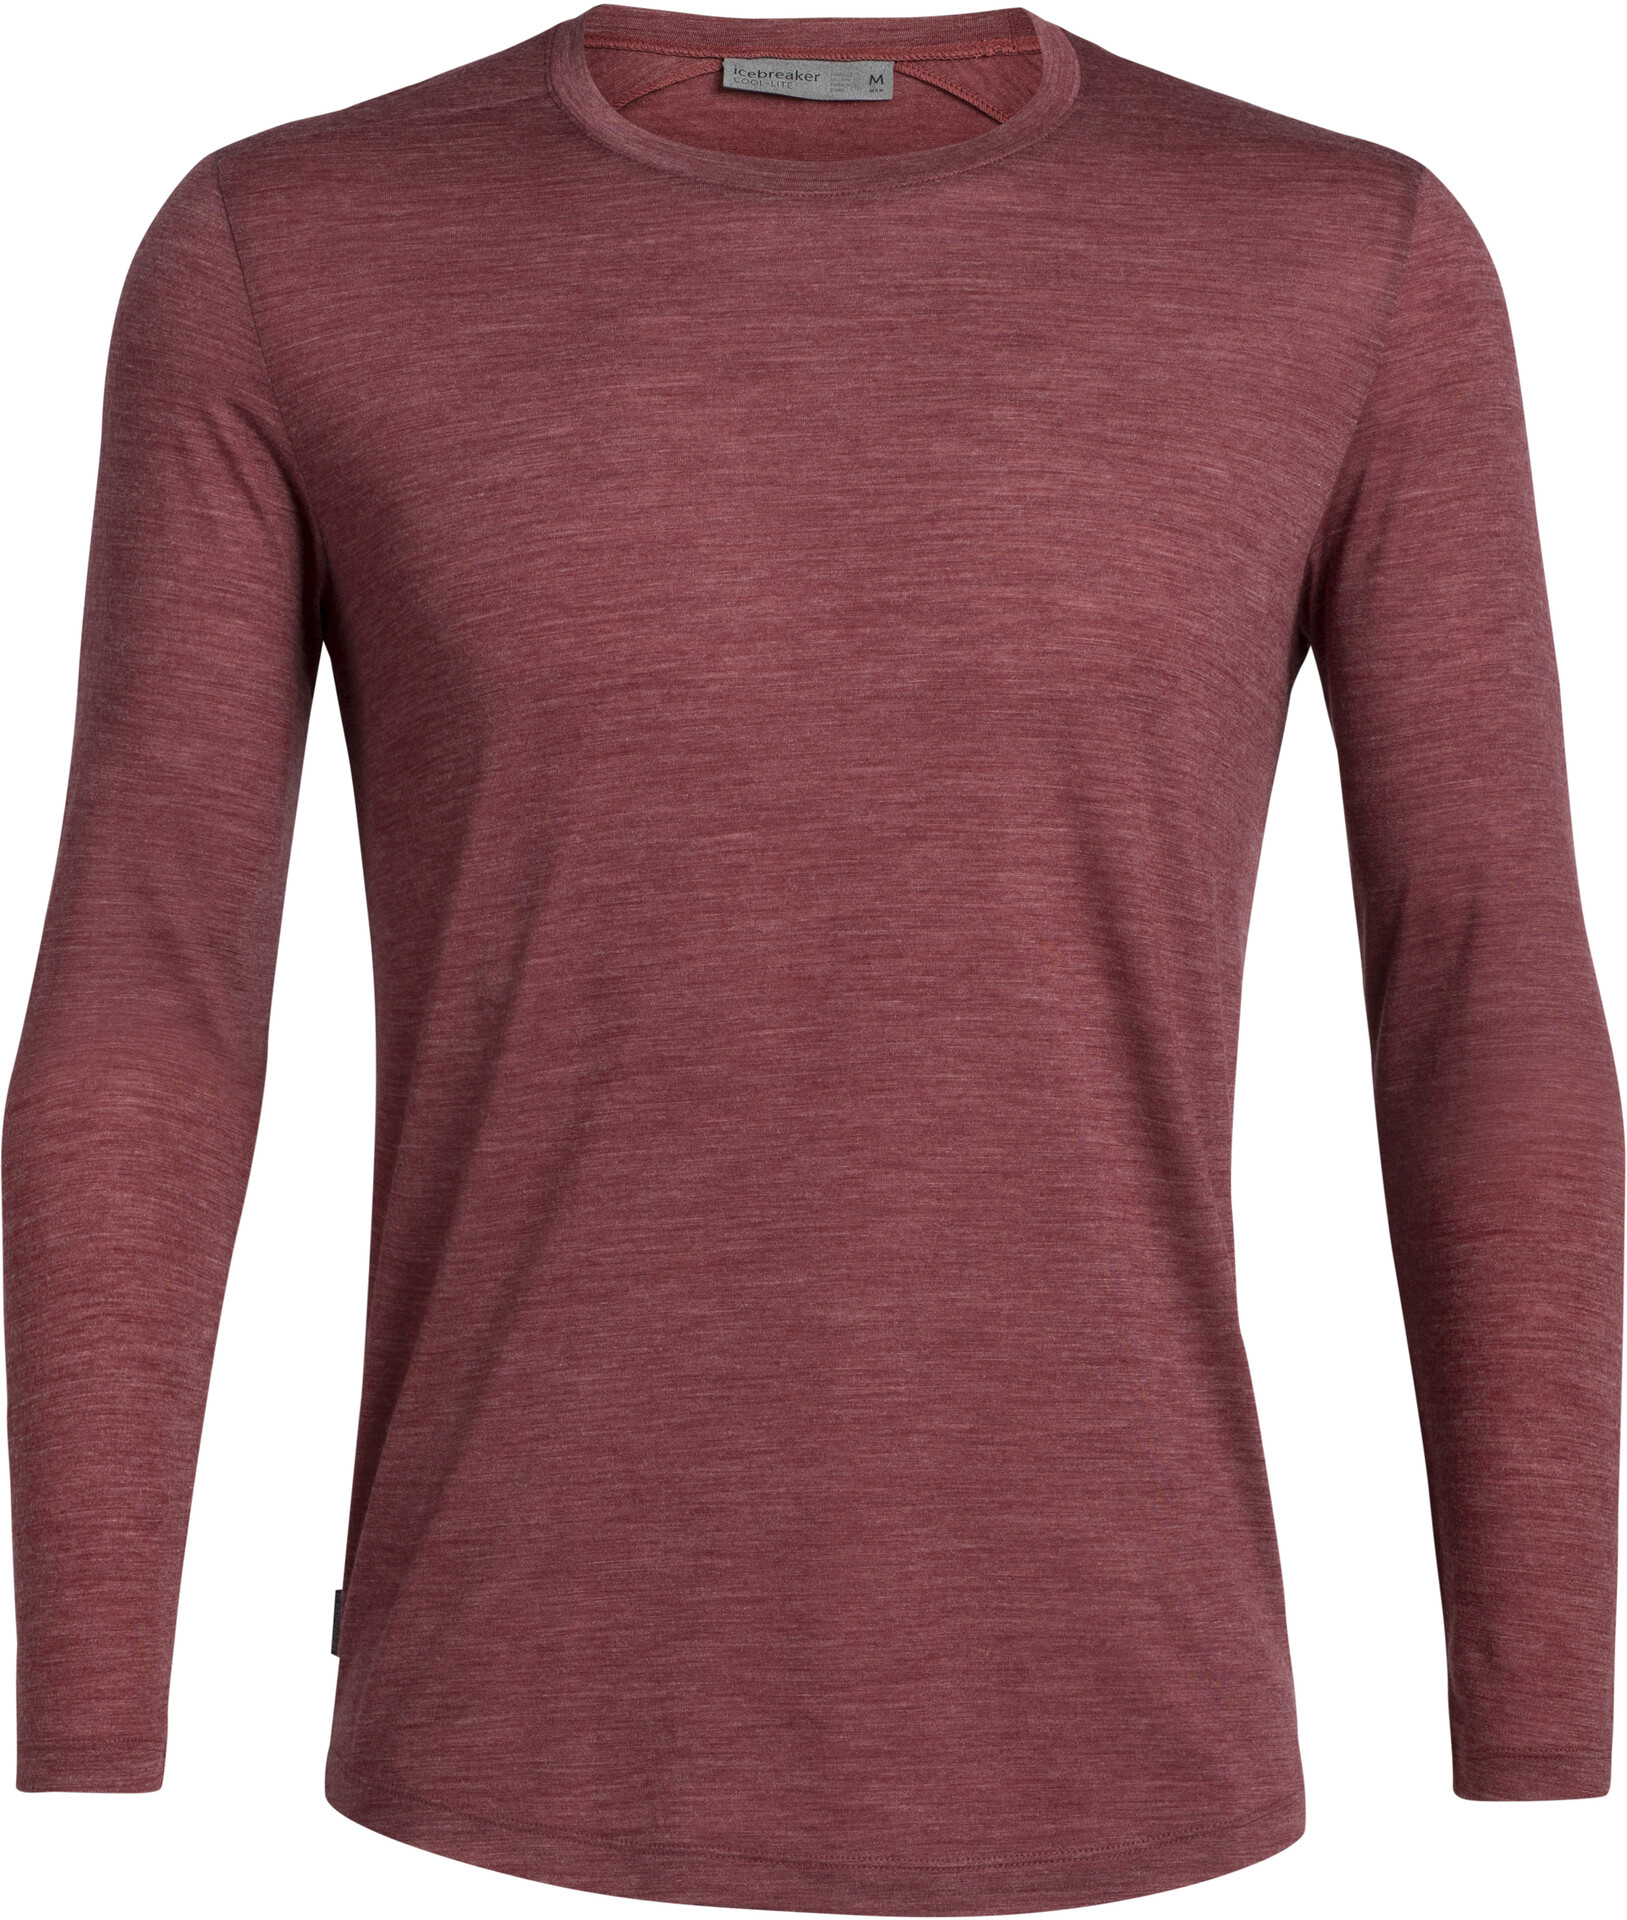 Icebreaker Sphere Langærmet T shirt Herrer, cabernet heather